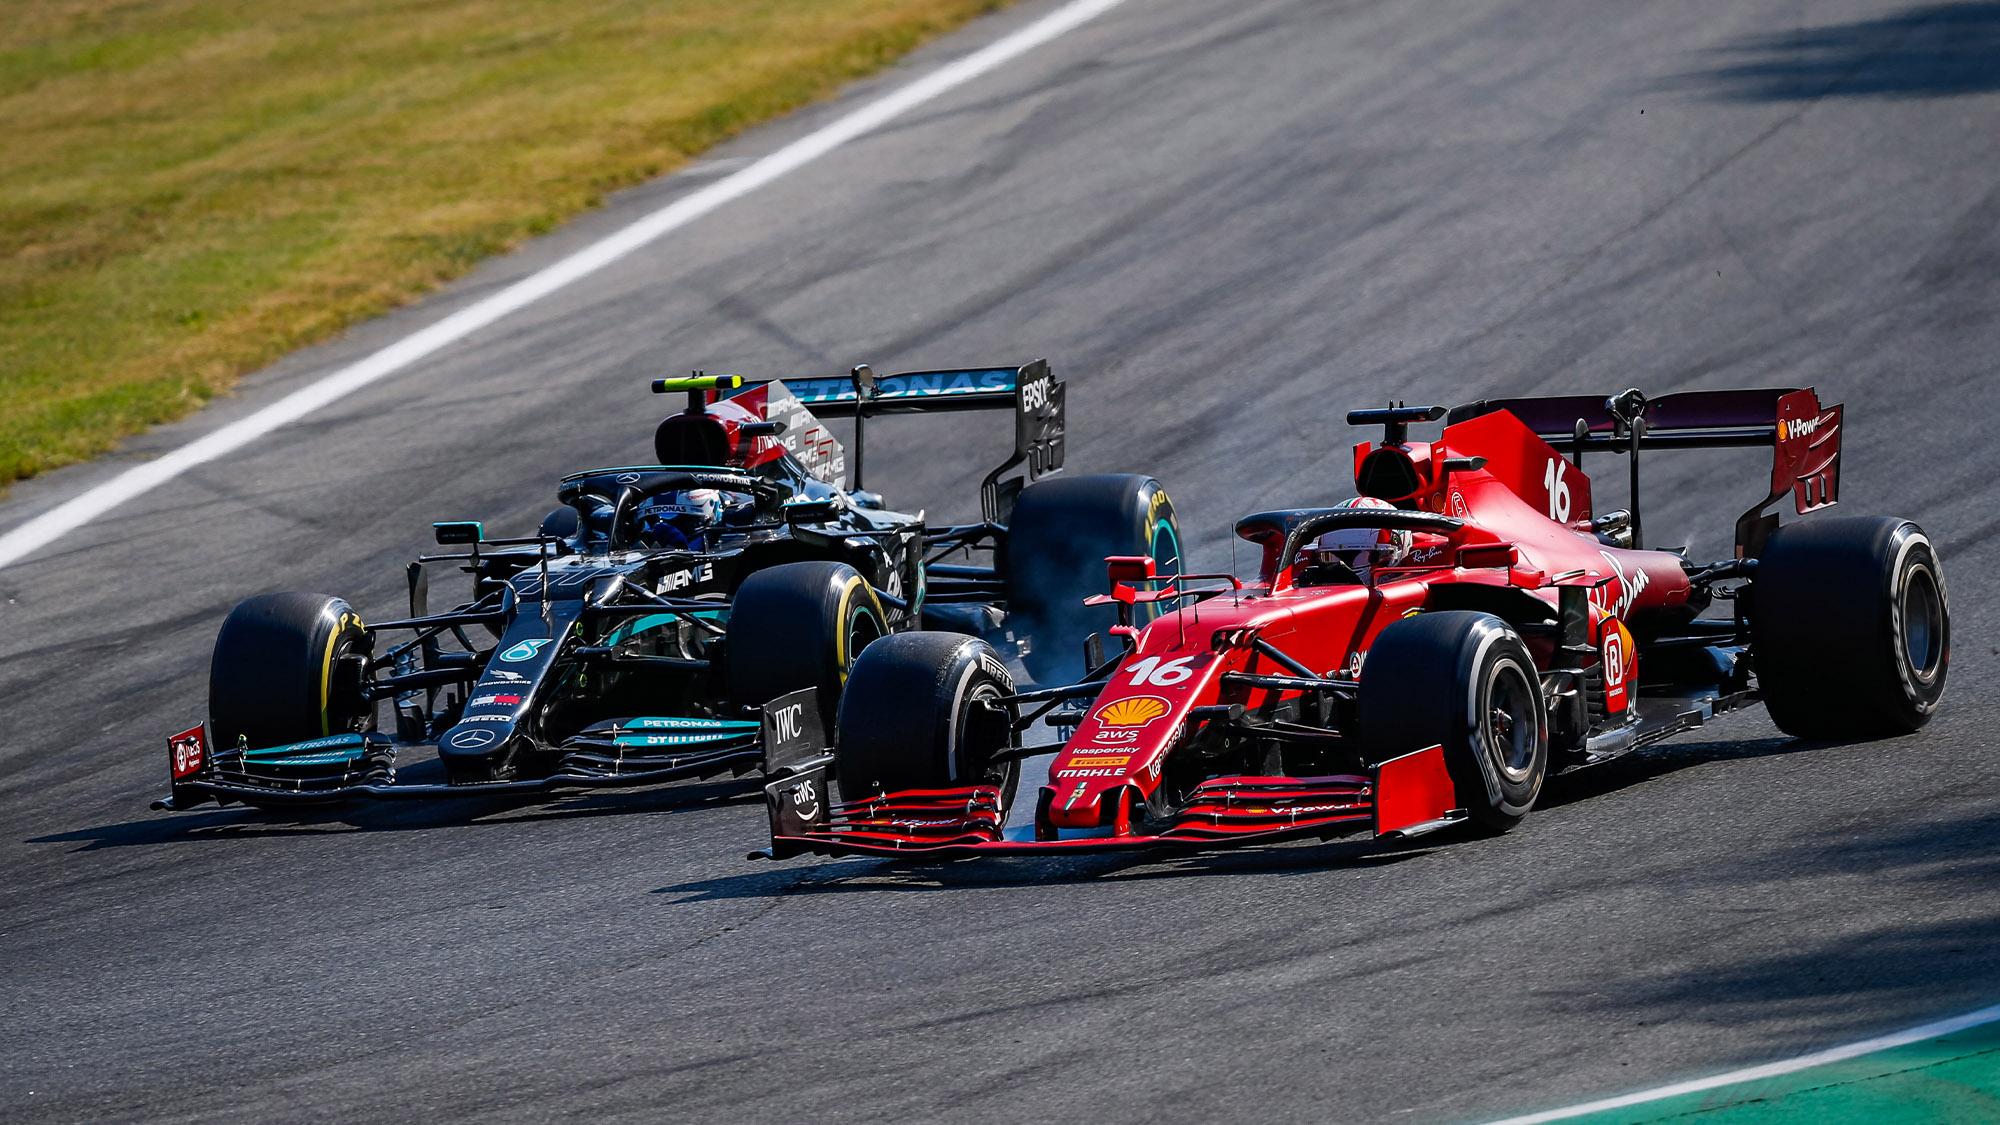 Valtteri Bottas and Charles Leclerc battle in the 2021 Italioan Grand Prix